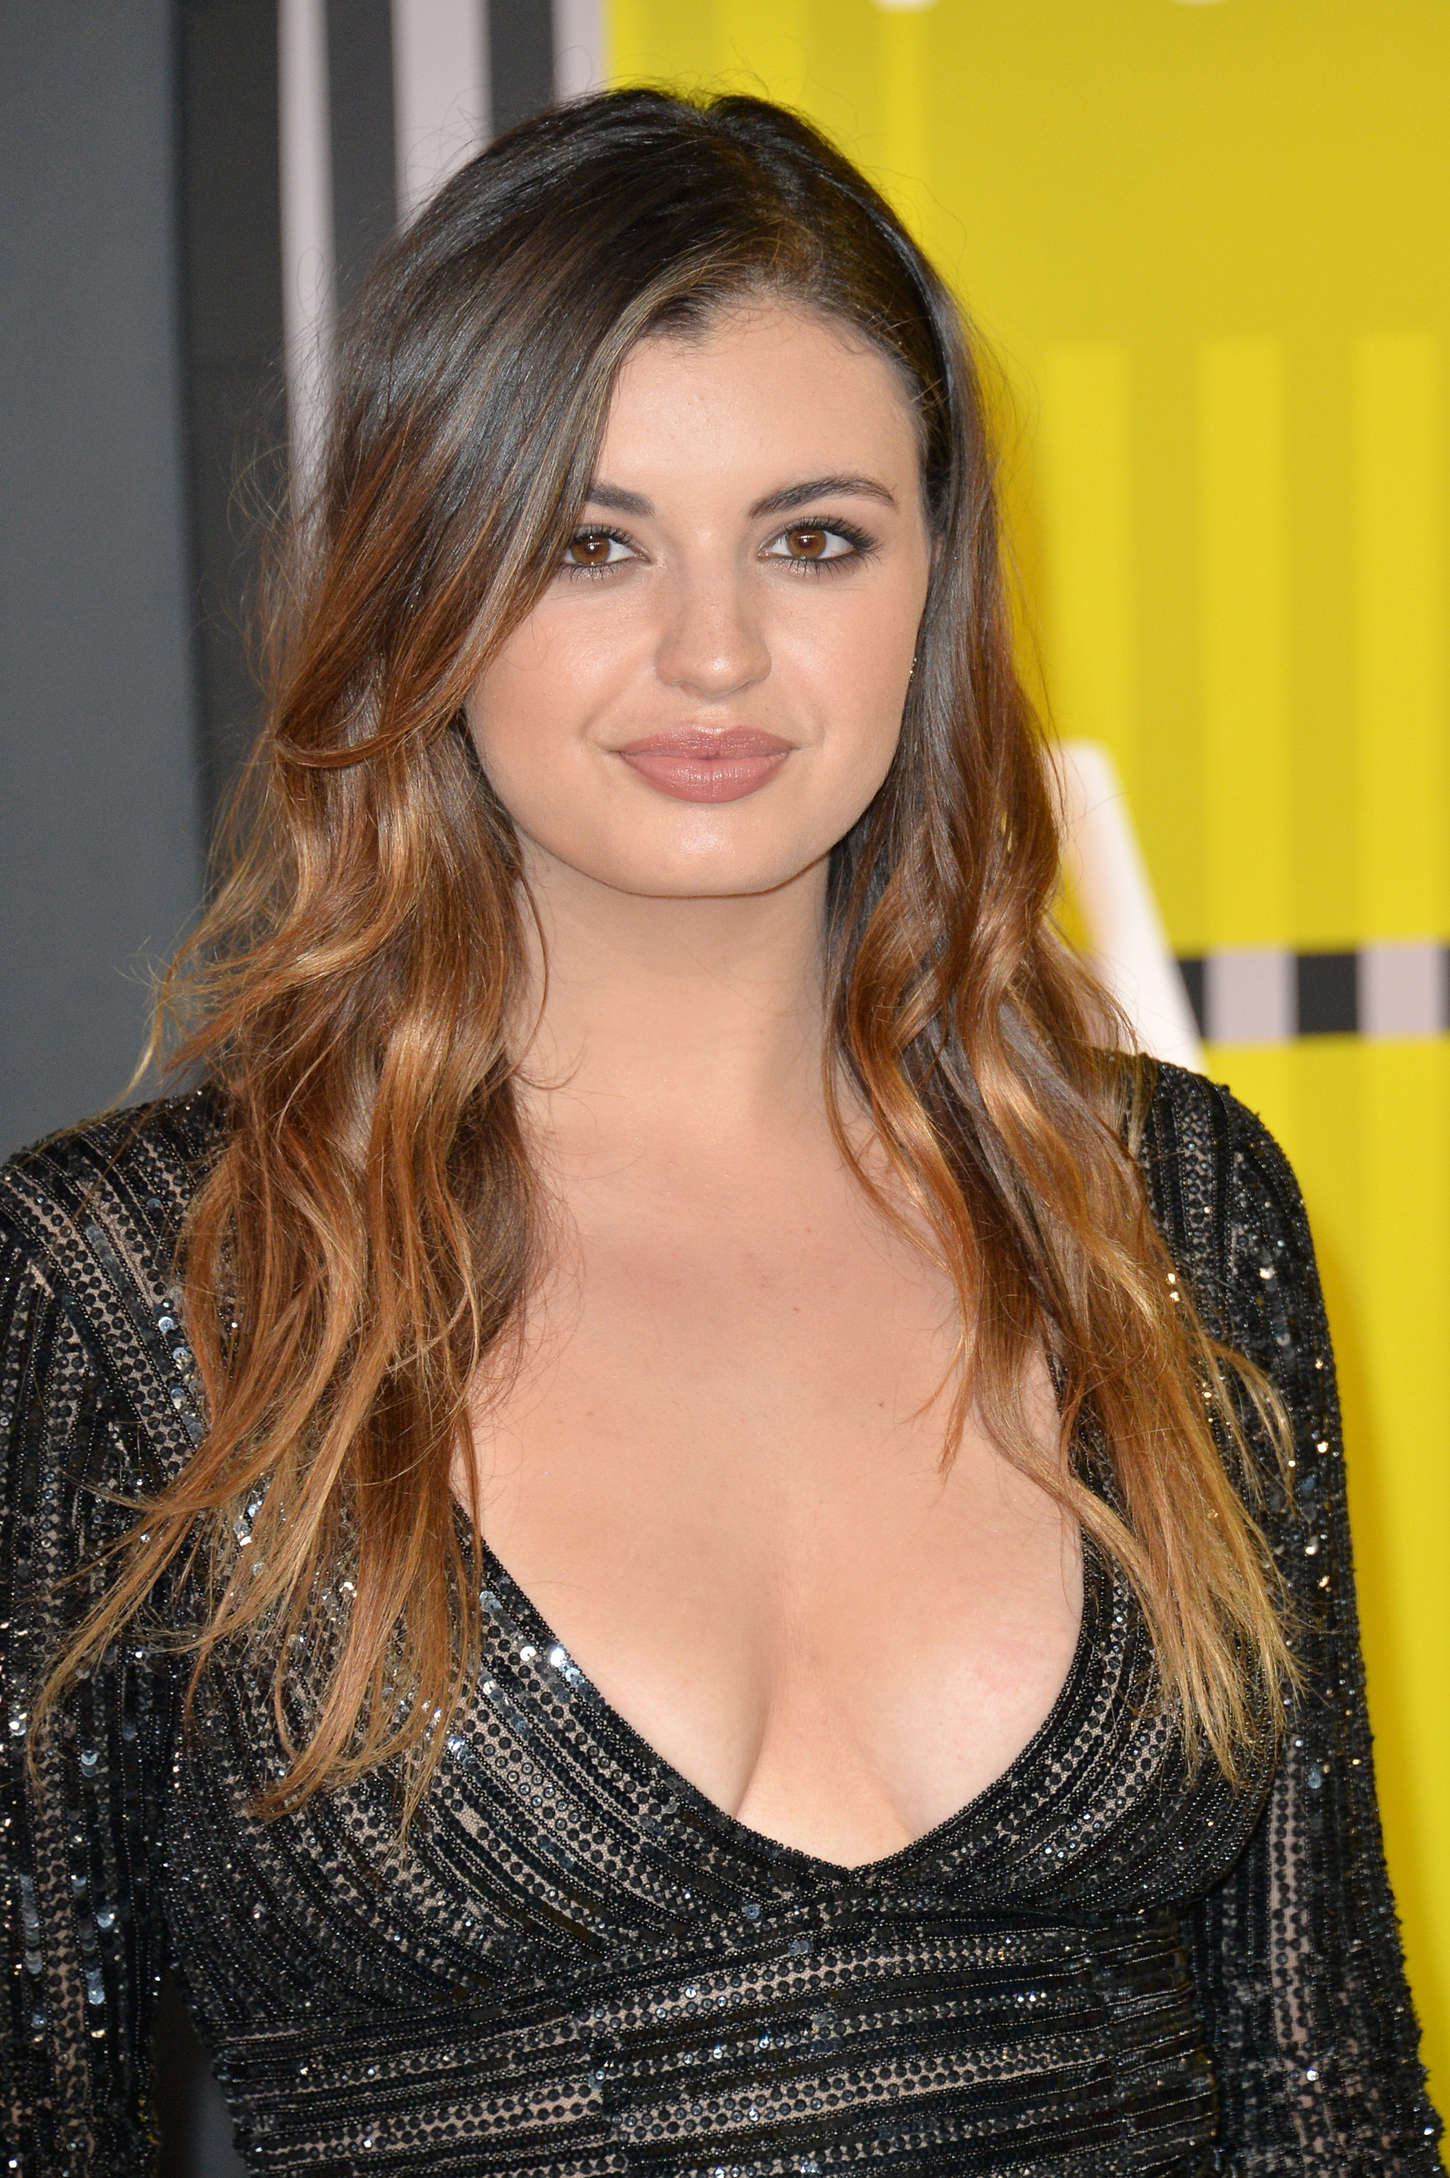 Rebecca Black MTV Video Music Awards in Los Angeles